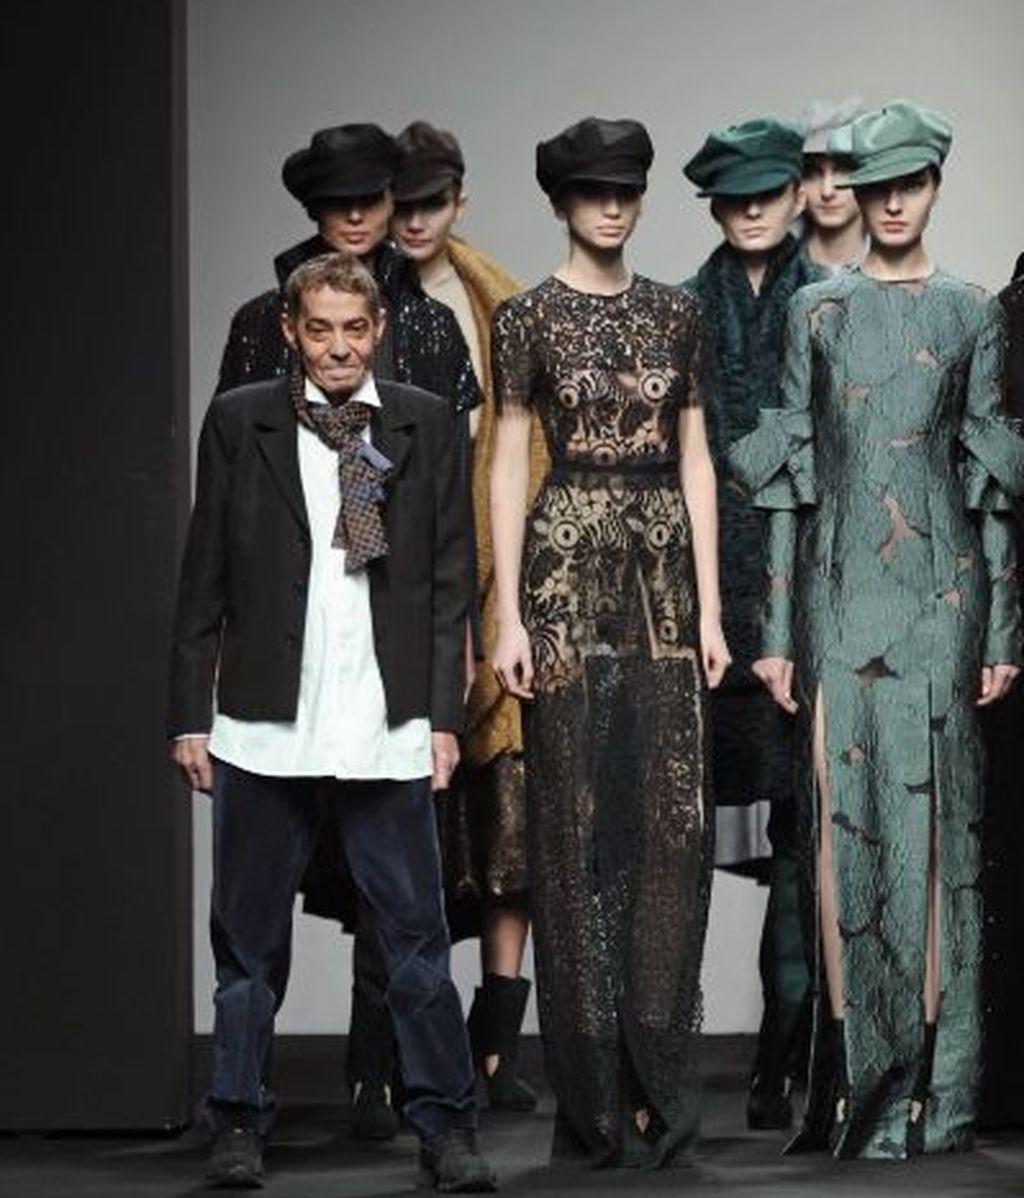 Desfiló en la semana de la moda de Madrid hasta este 2011